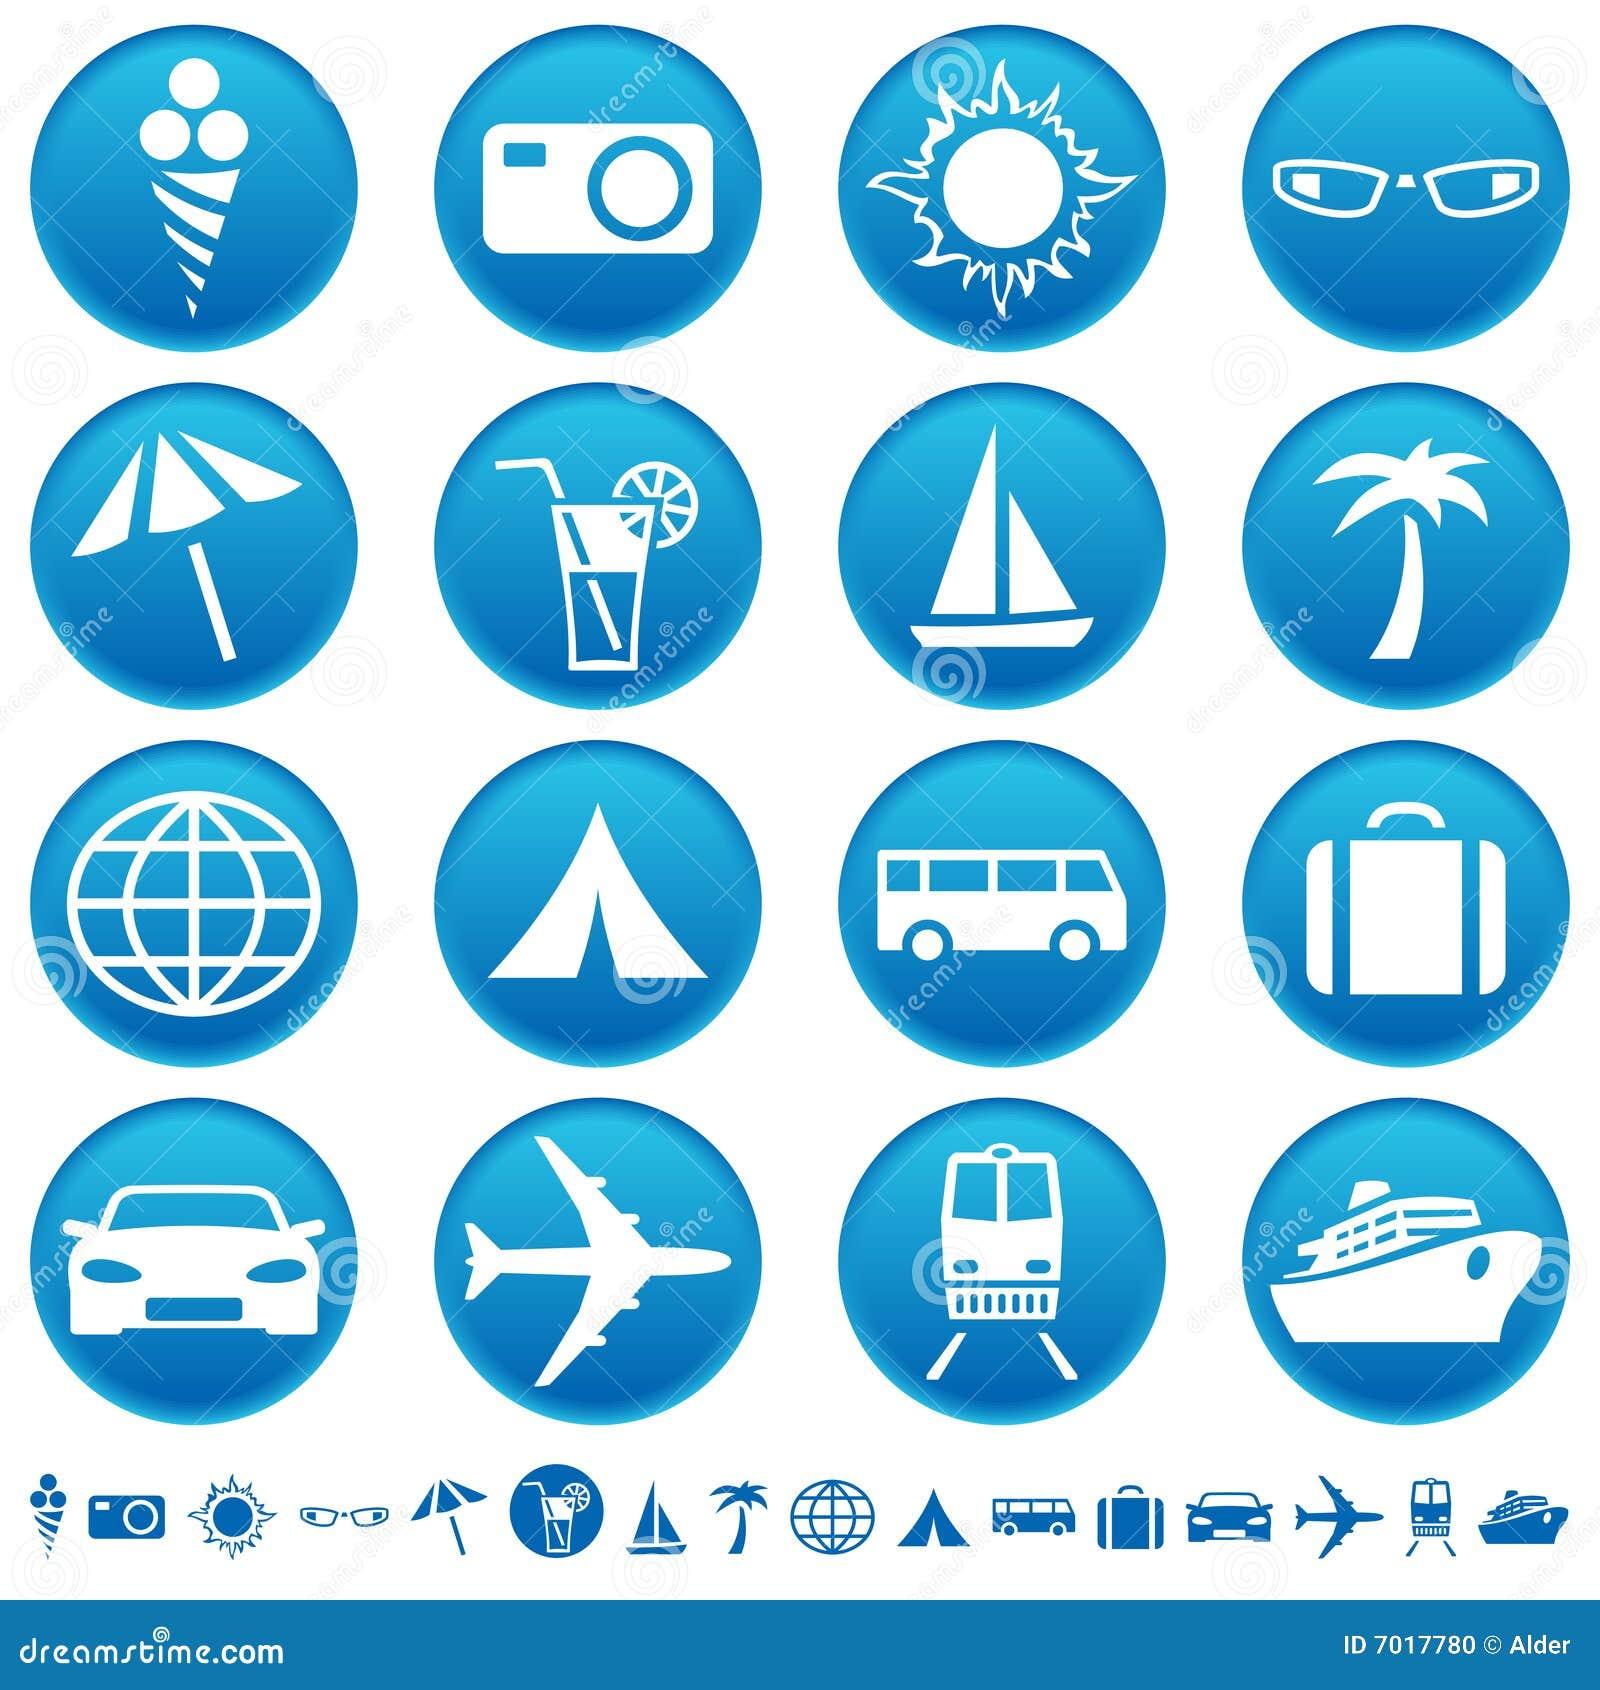 Travel & tourism icons